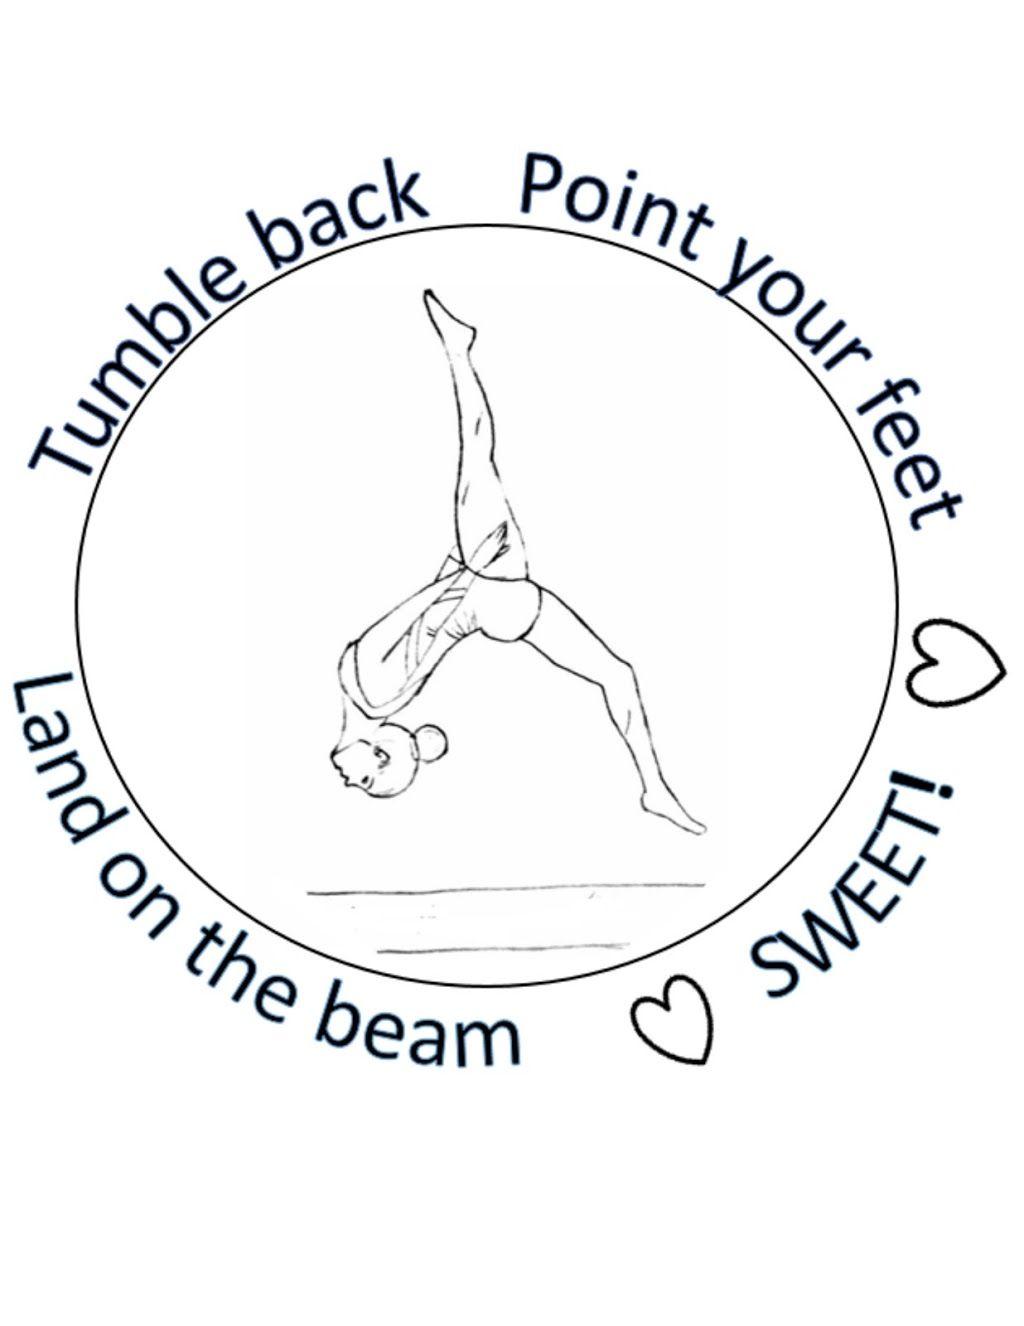 Gymnastics Coloring Page Gym Rat Gym Fun [ 1326 x 1024 Pixel ]